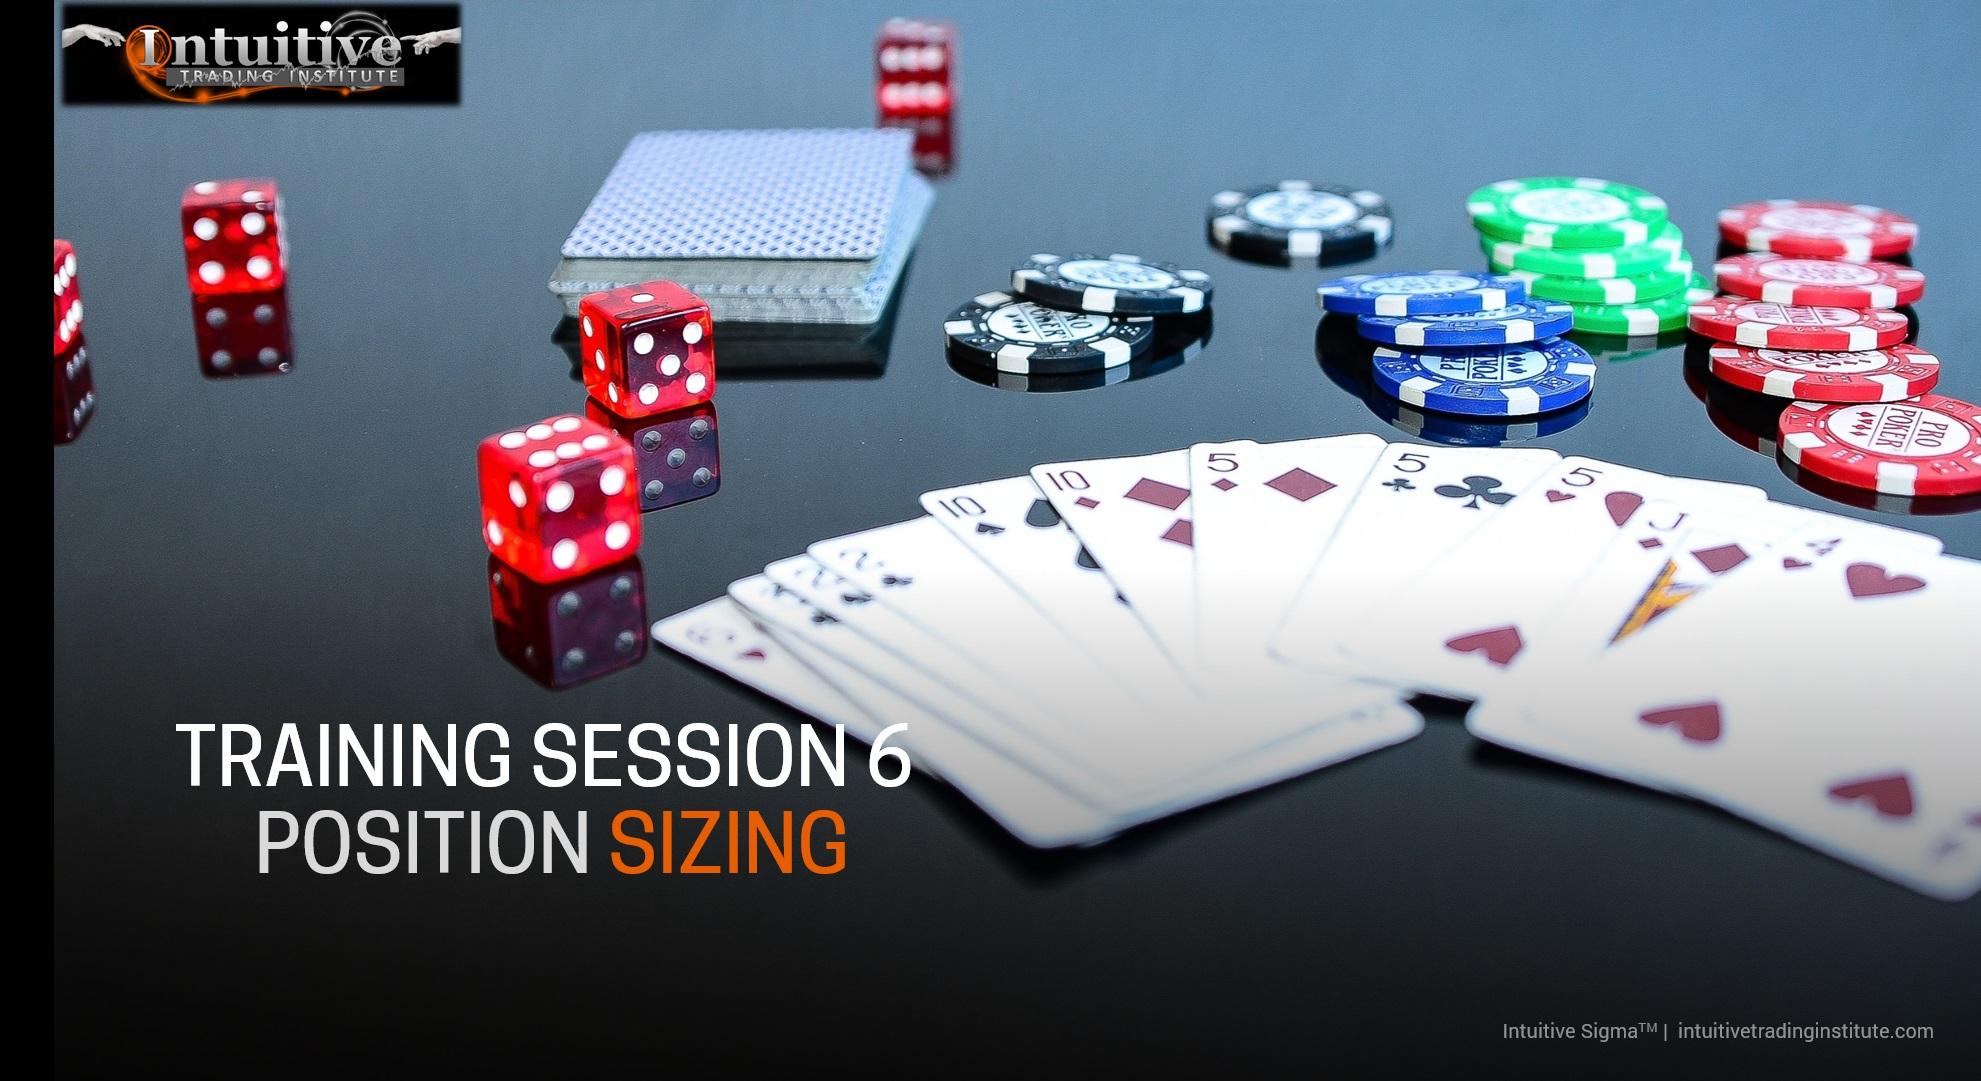 Trainining Session 6